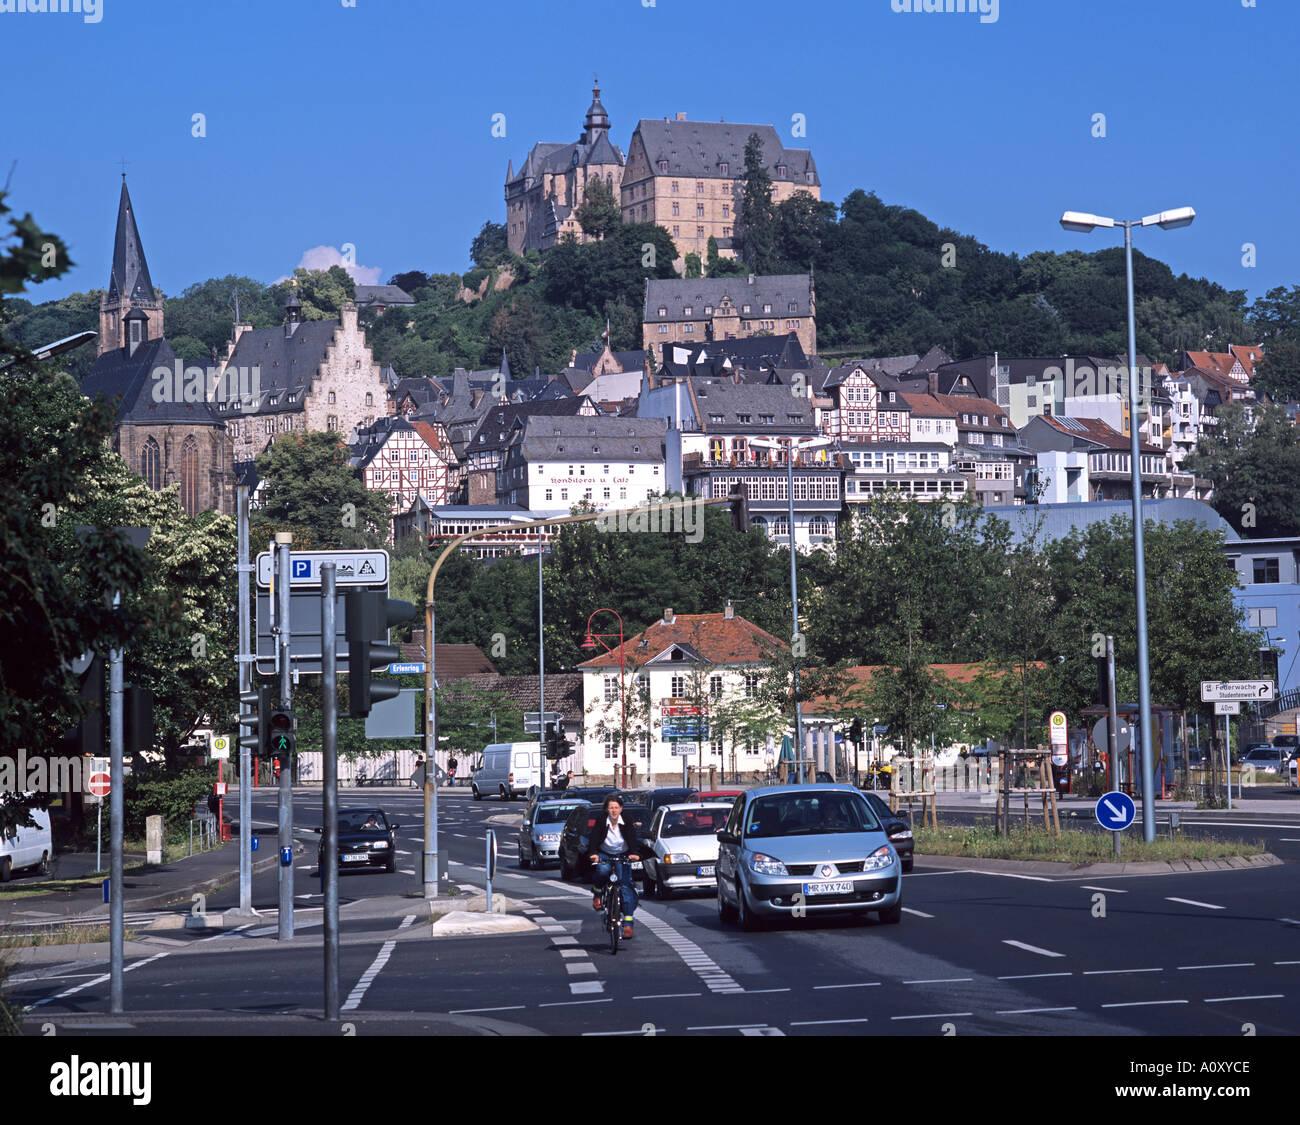 europa europe germany deutschland hessen hesse marburg schloss castle stock photo royalty free. Black Bedroom Furniture Sets. Home Design Ideas